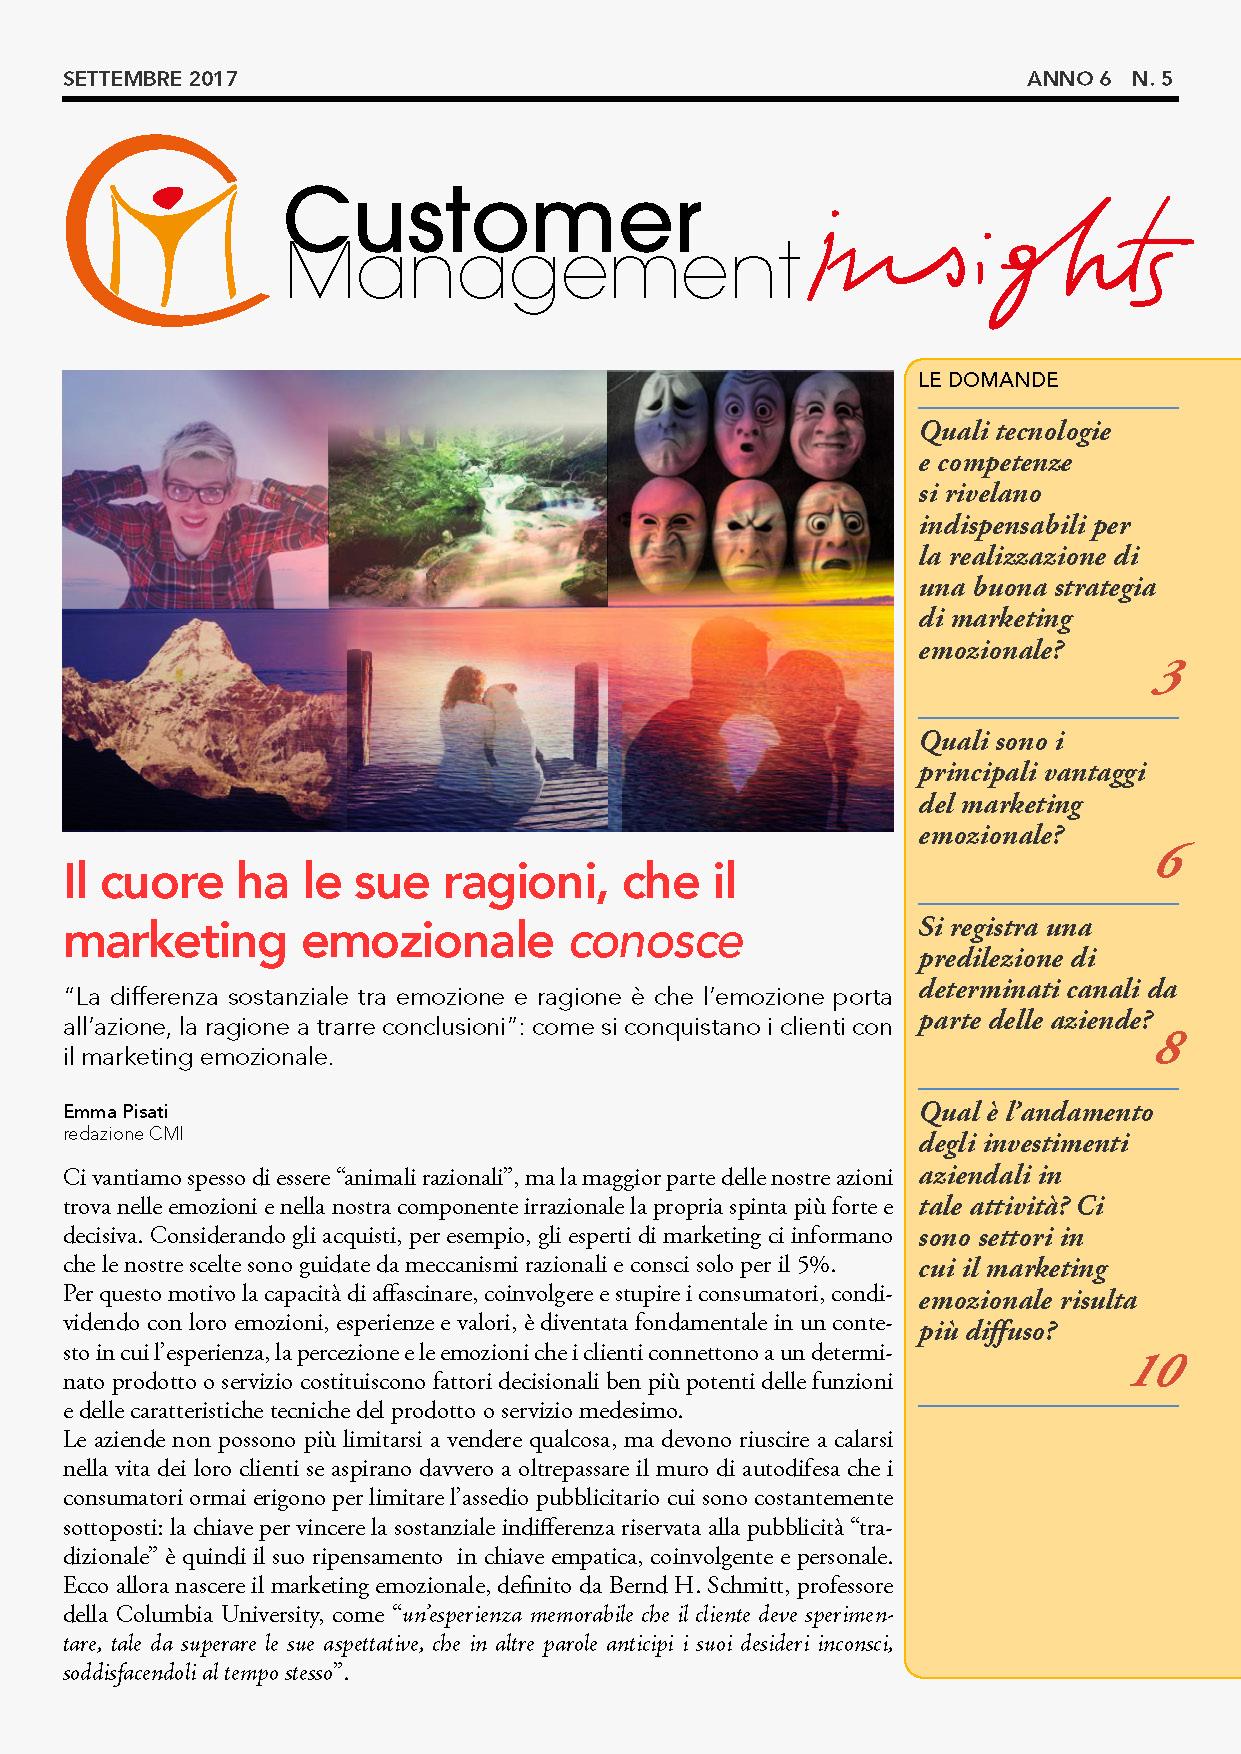 Marketing emozionale – CMI anno 6 n. 5